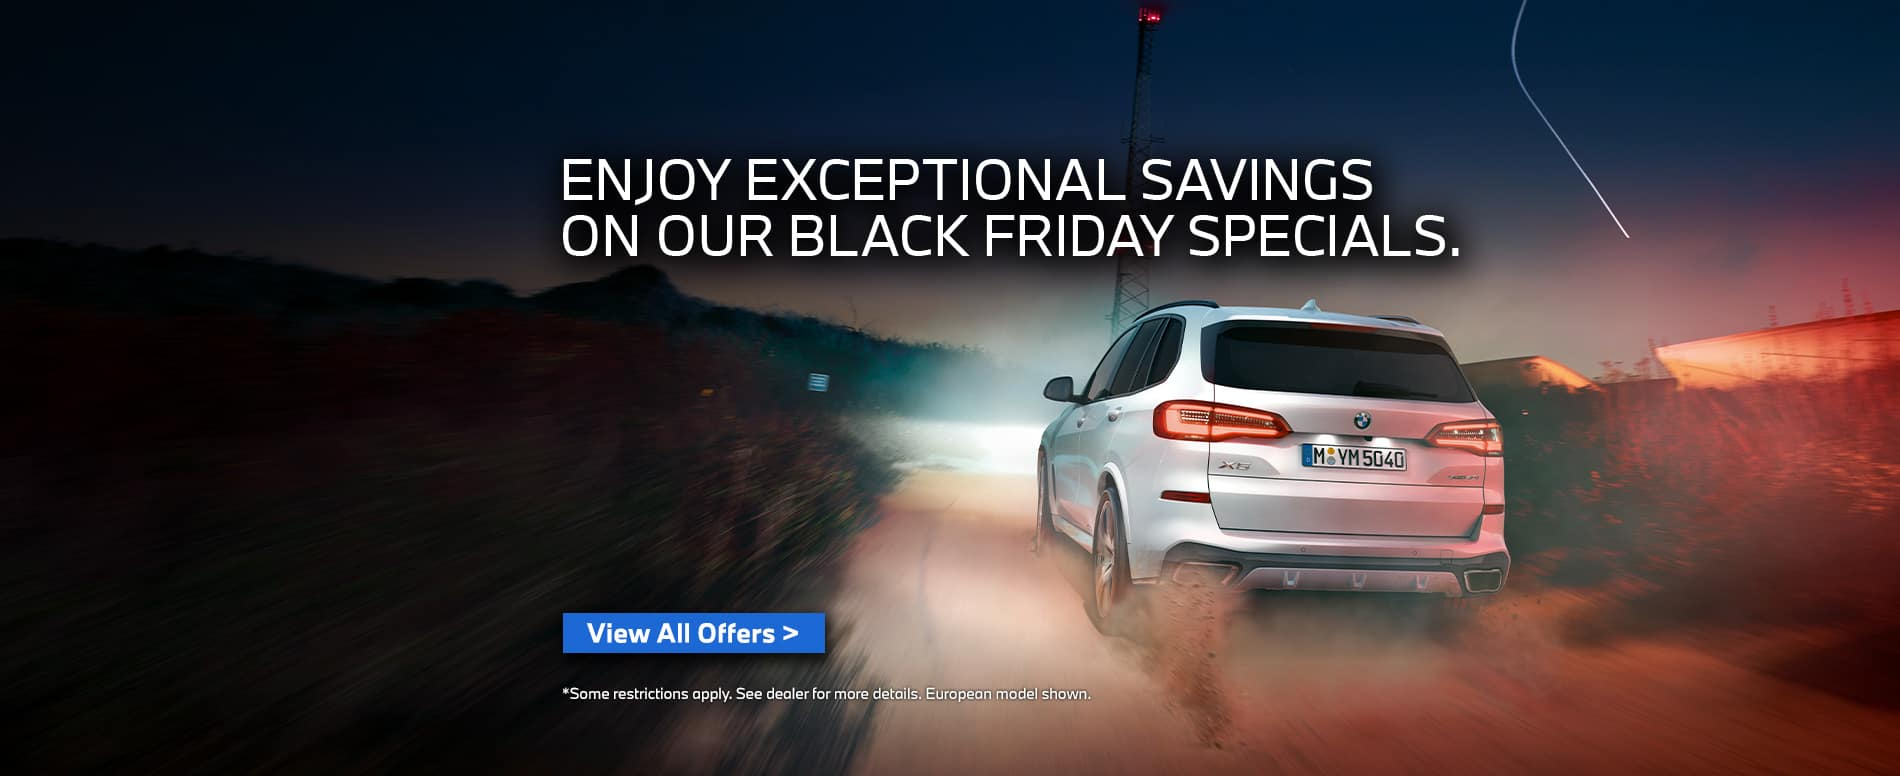 Nov20-BMW-BlackFridaySpecials-Banner